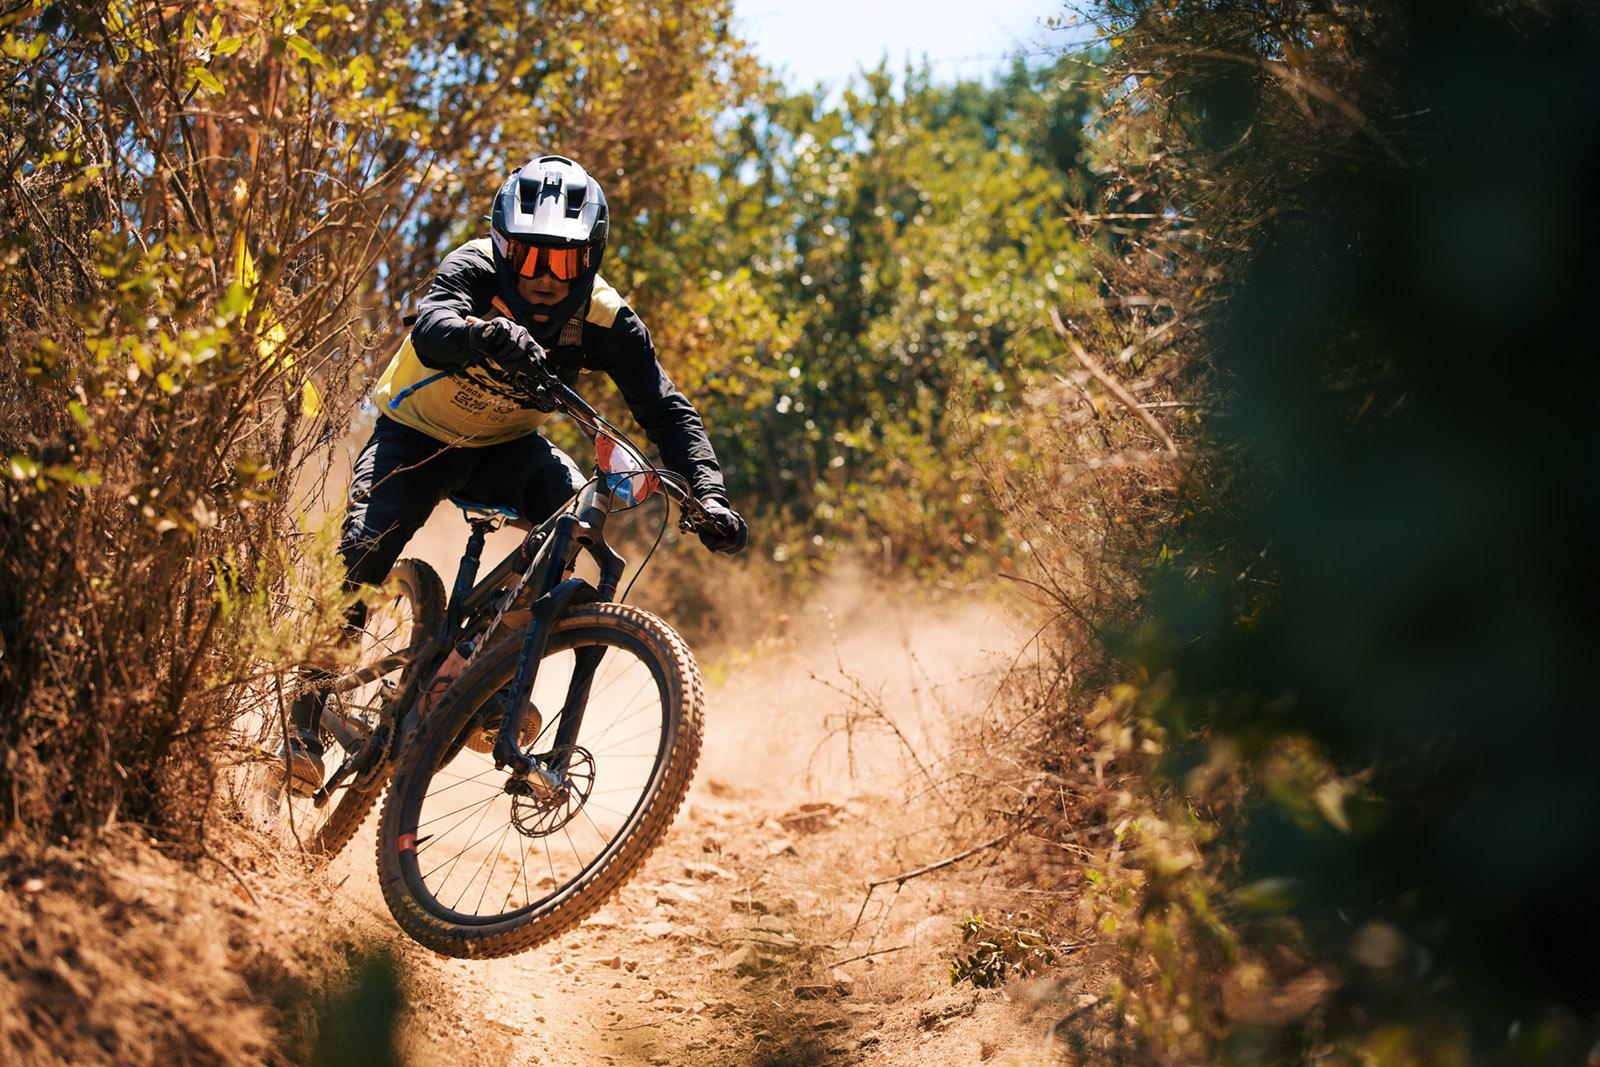 Santa Cruz Bicycles - Santa Cruz X SRAM Enduro Team Rider Mark Scott at Andes Pacifico